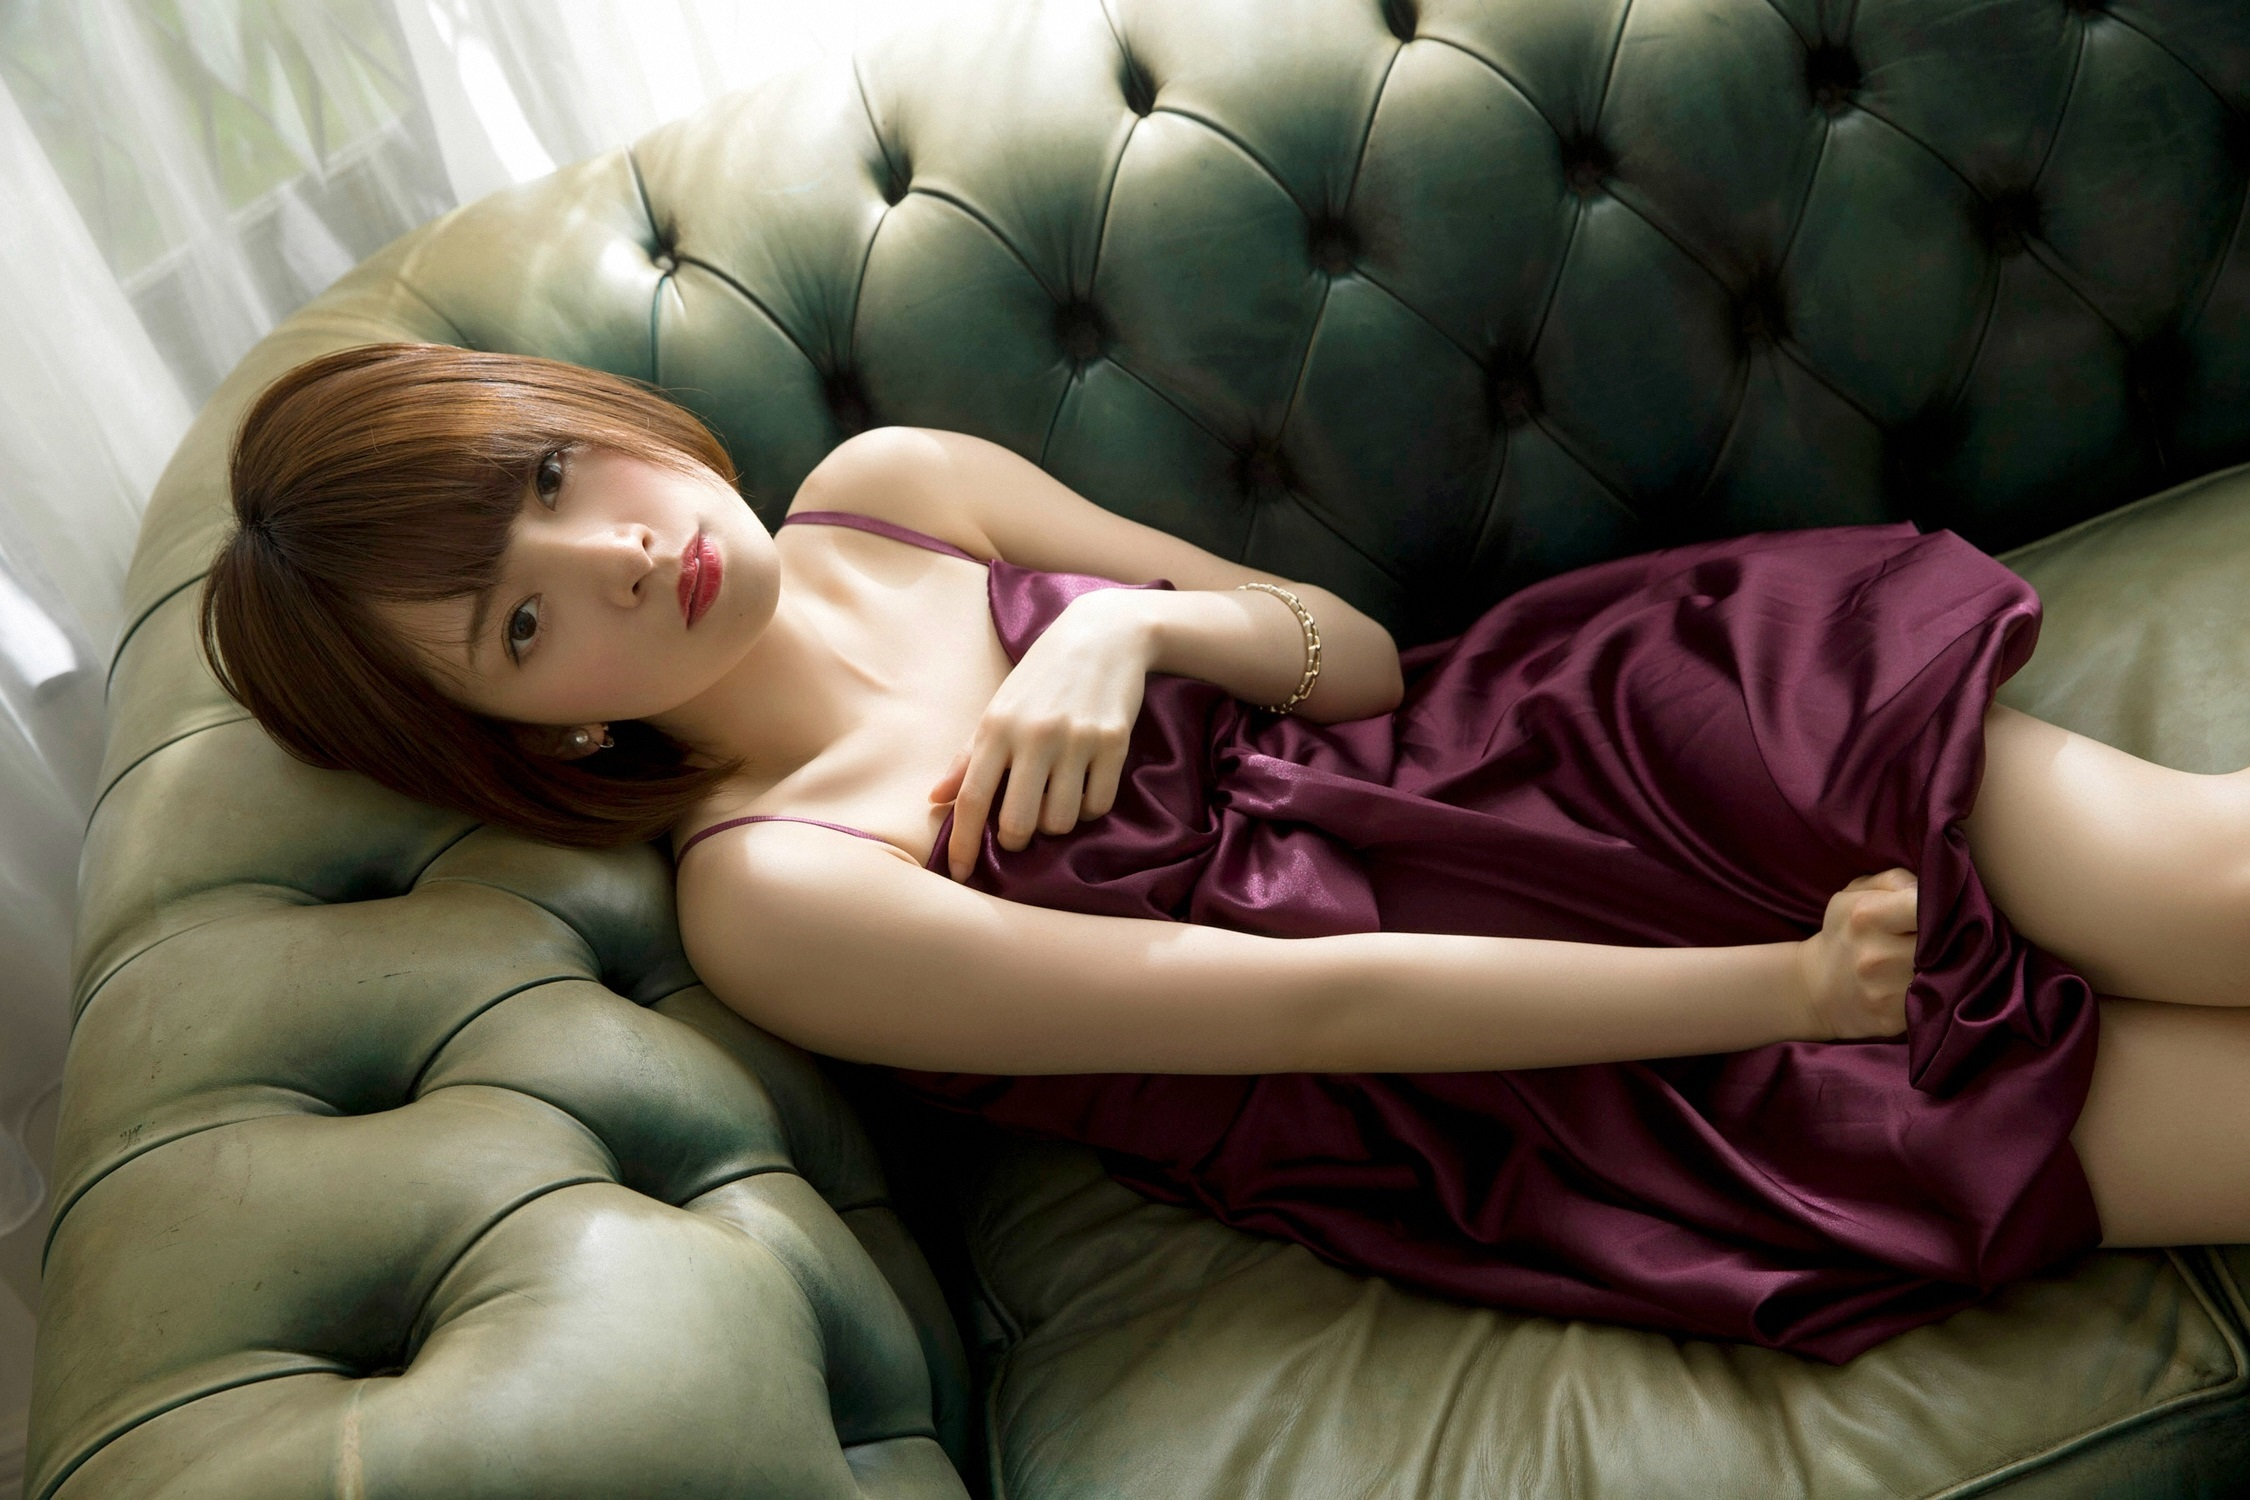 hashimoto_nanami032.jpg